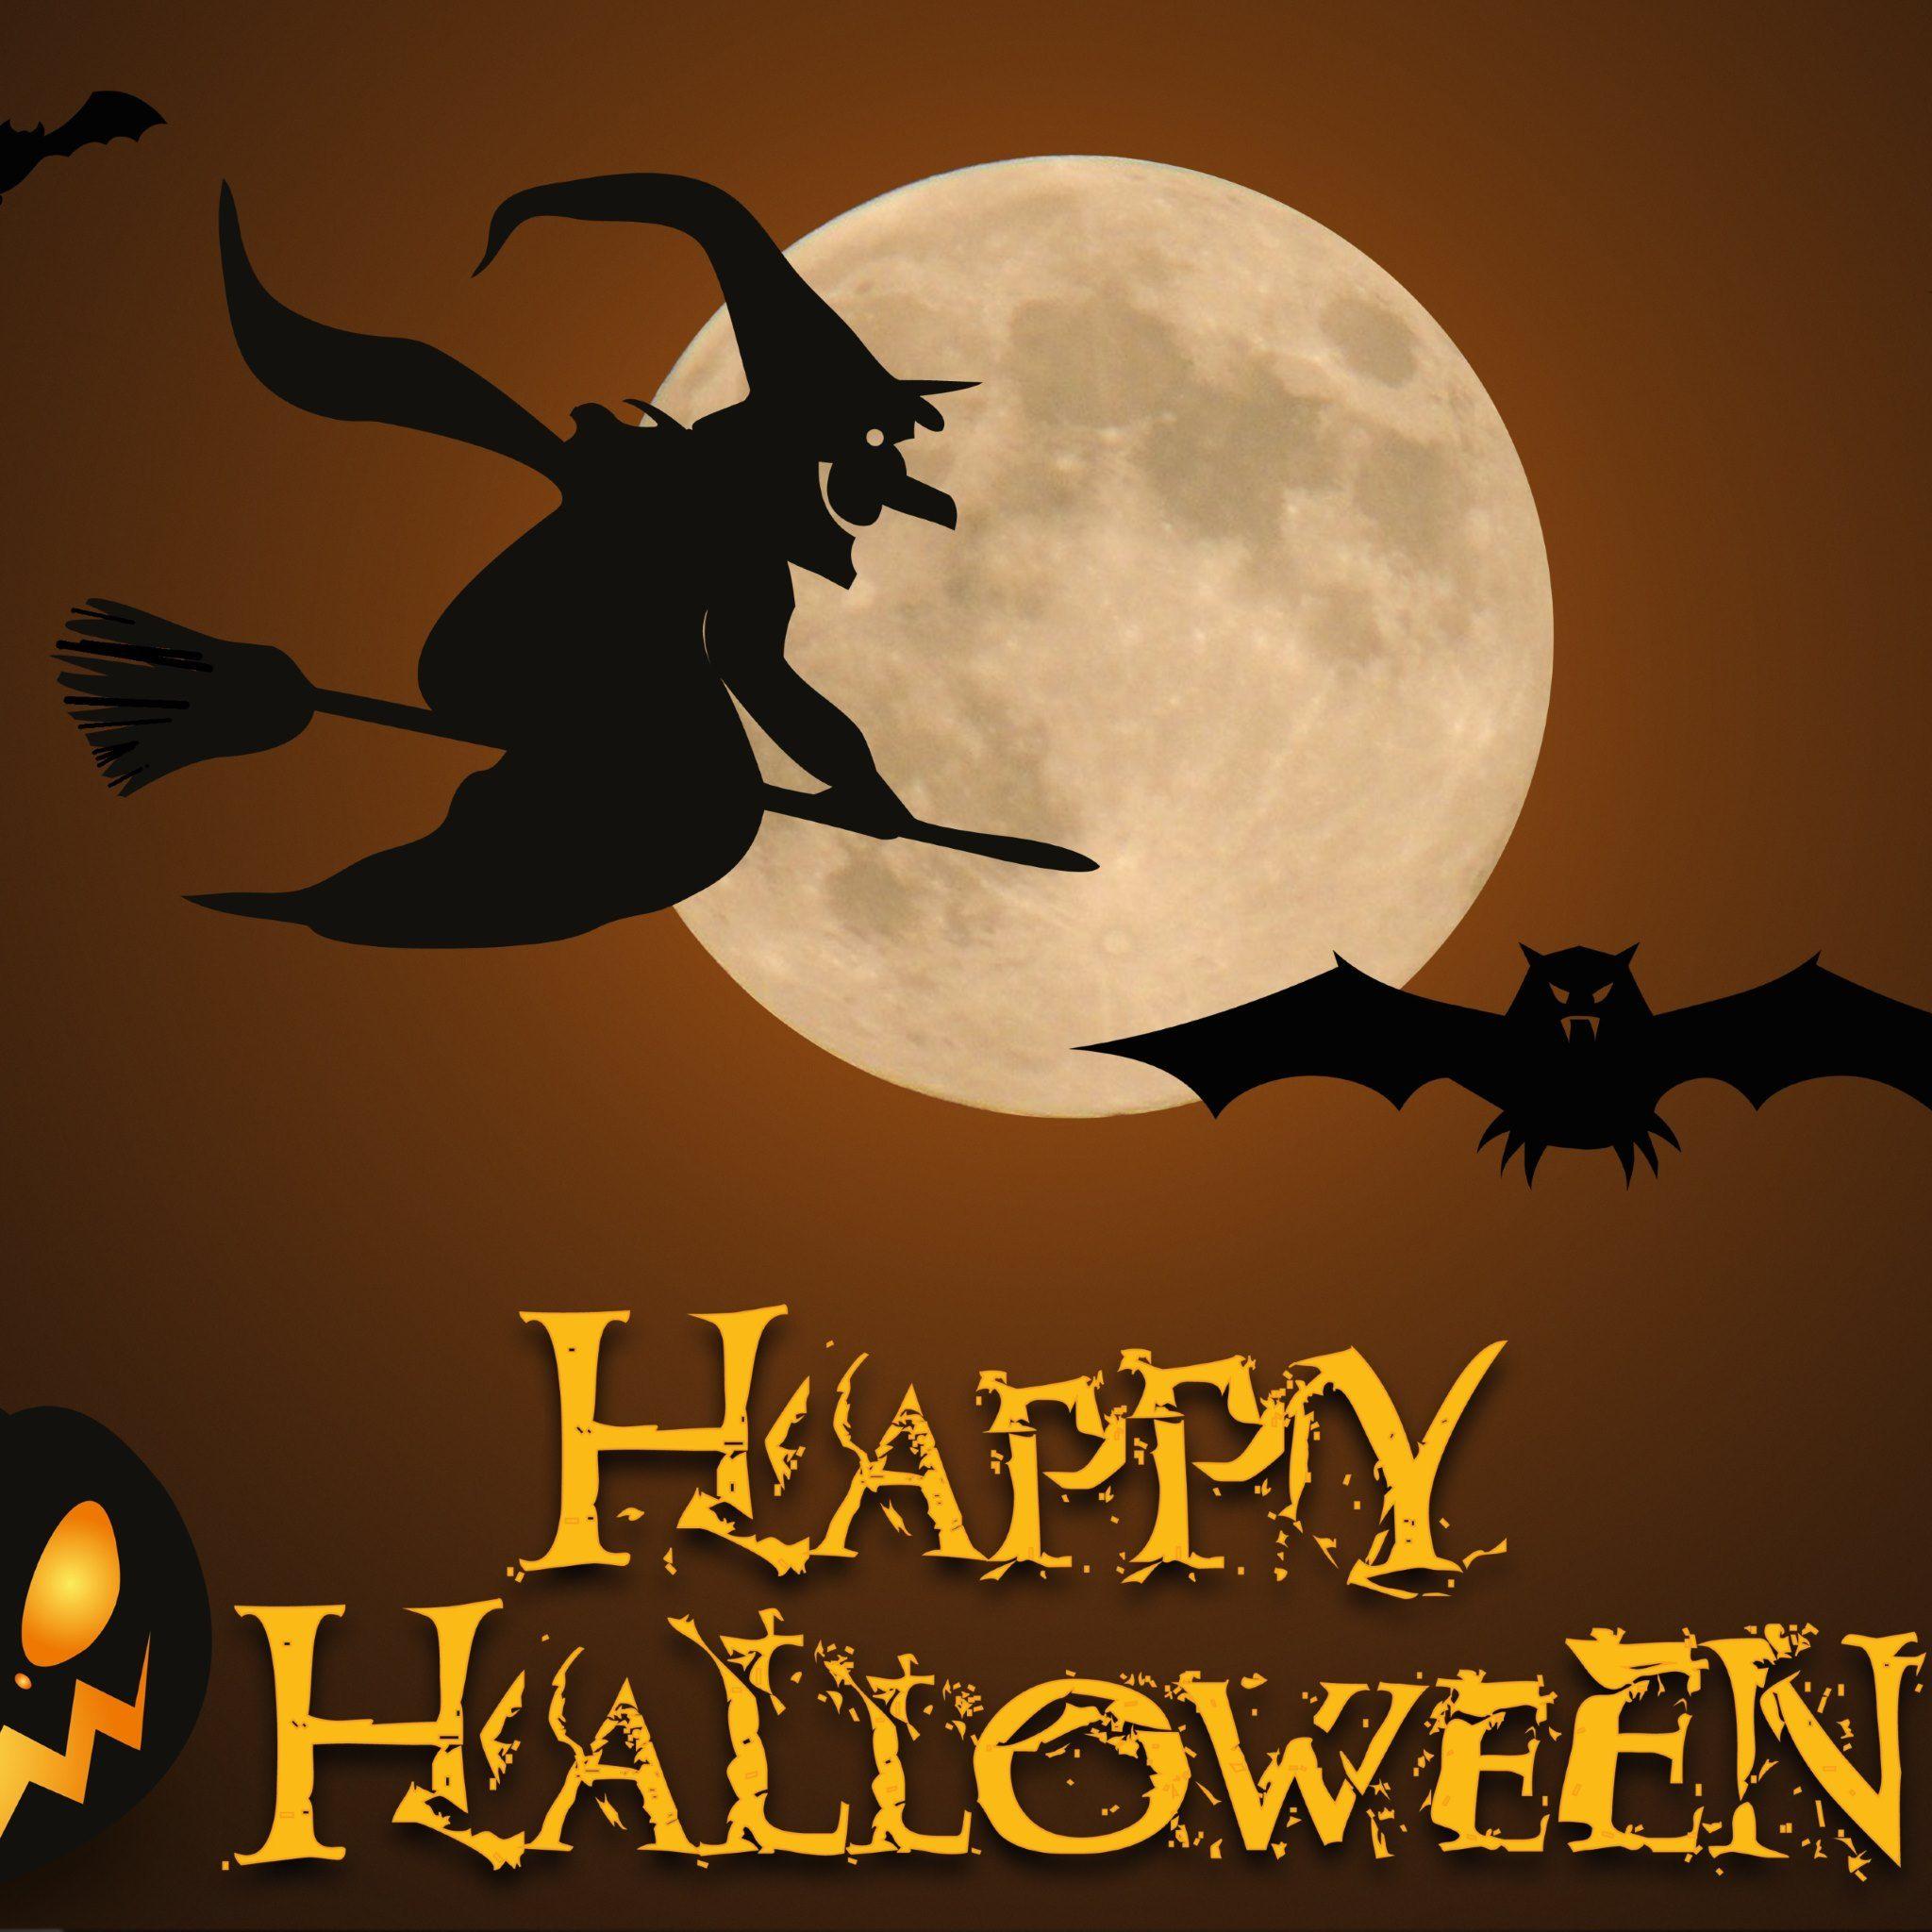 The Witch Of Halloween Wallpaper Image Free Artist Stefan Schweihofer License